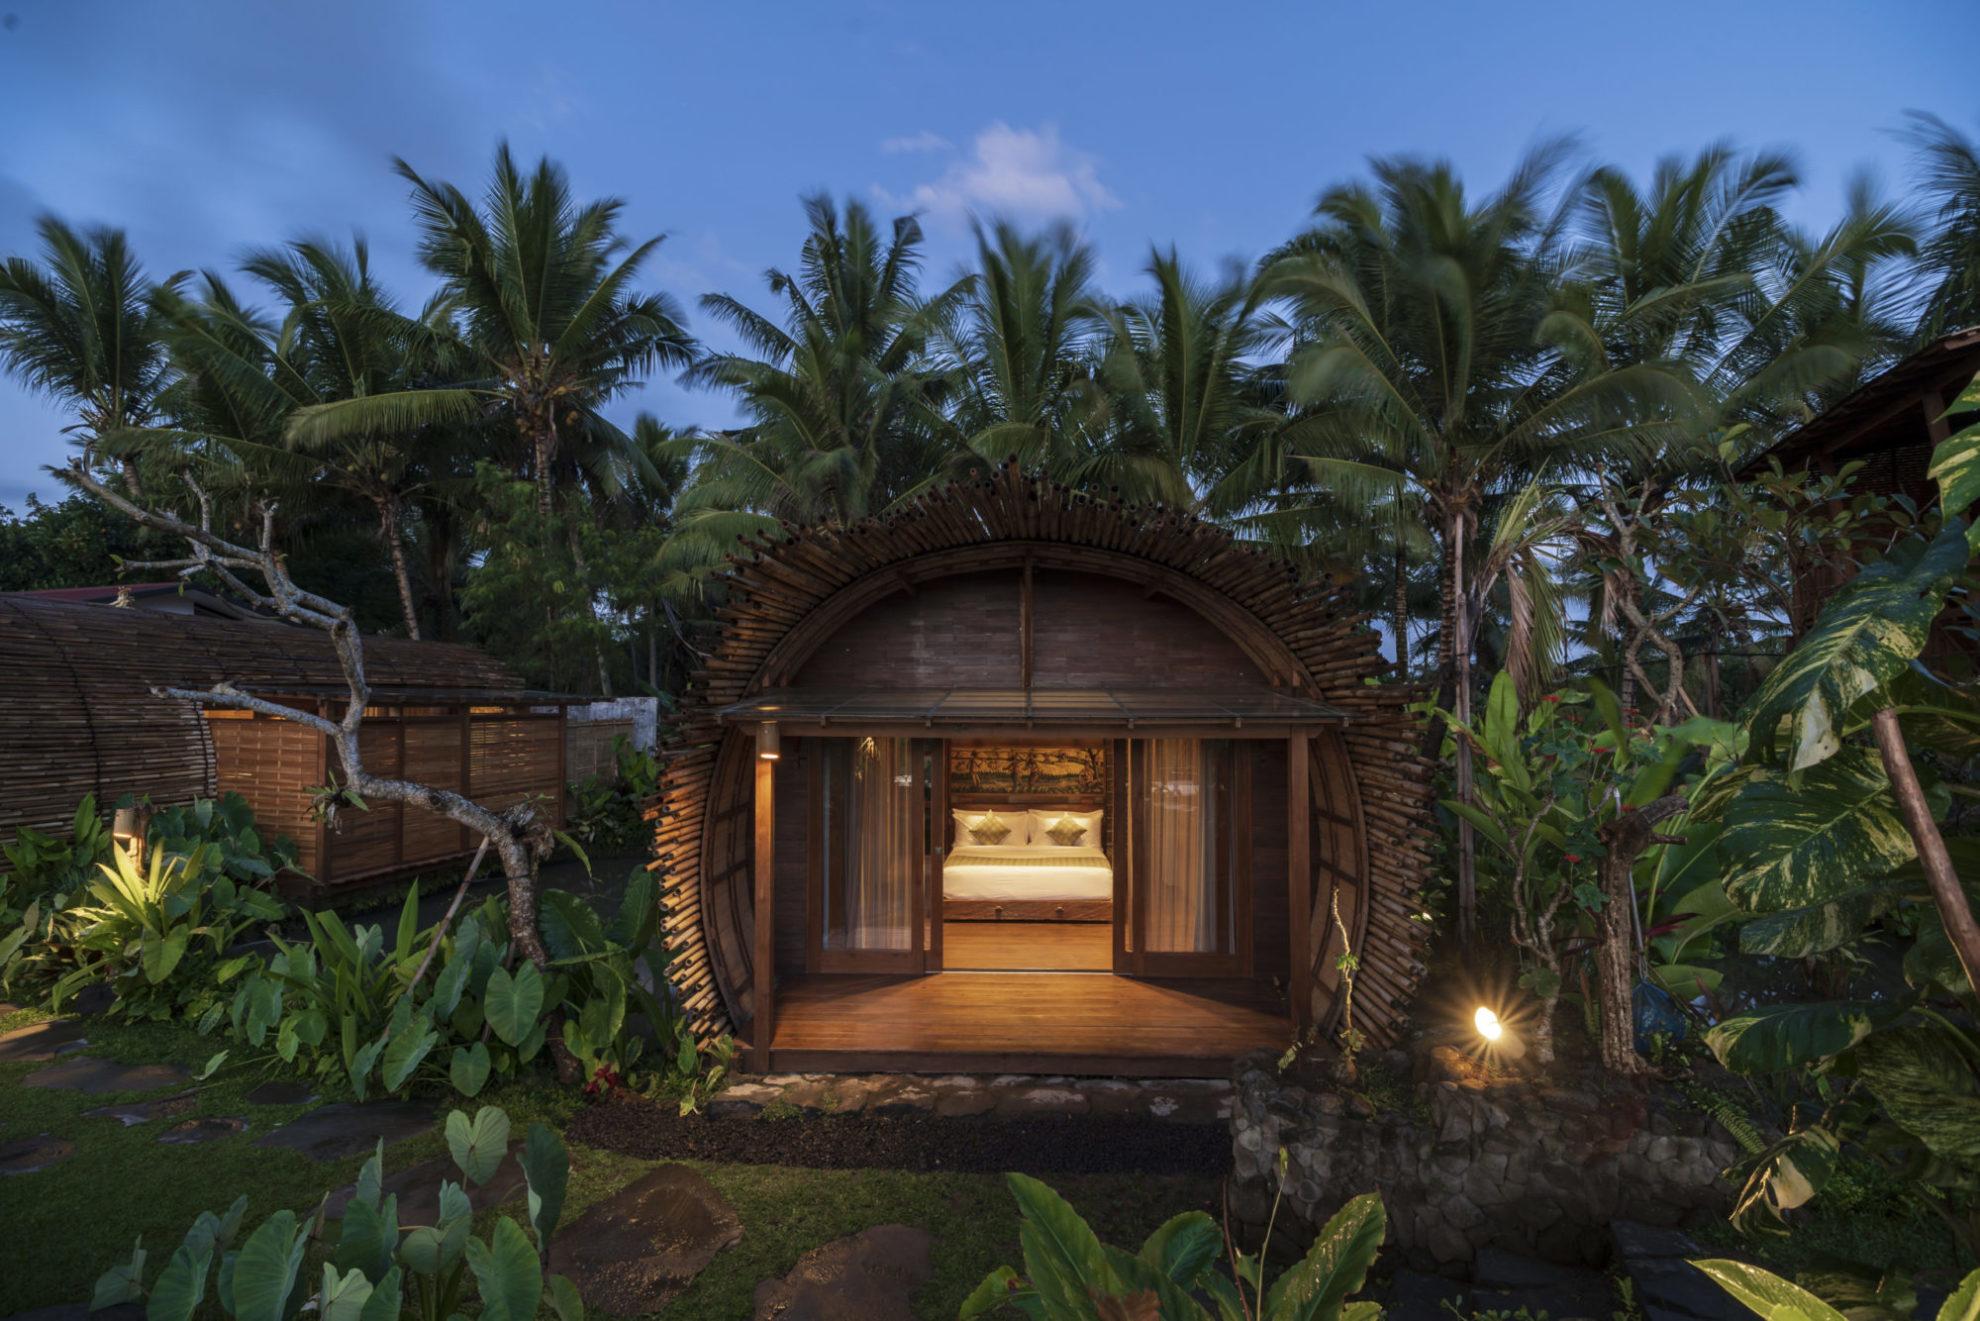 Indonesia - Ubud - 18268 - Exterior Lodge